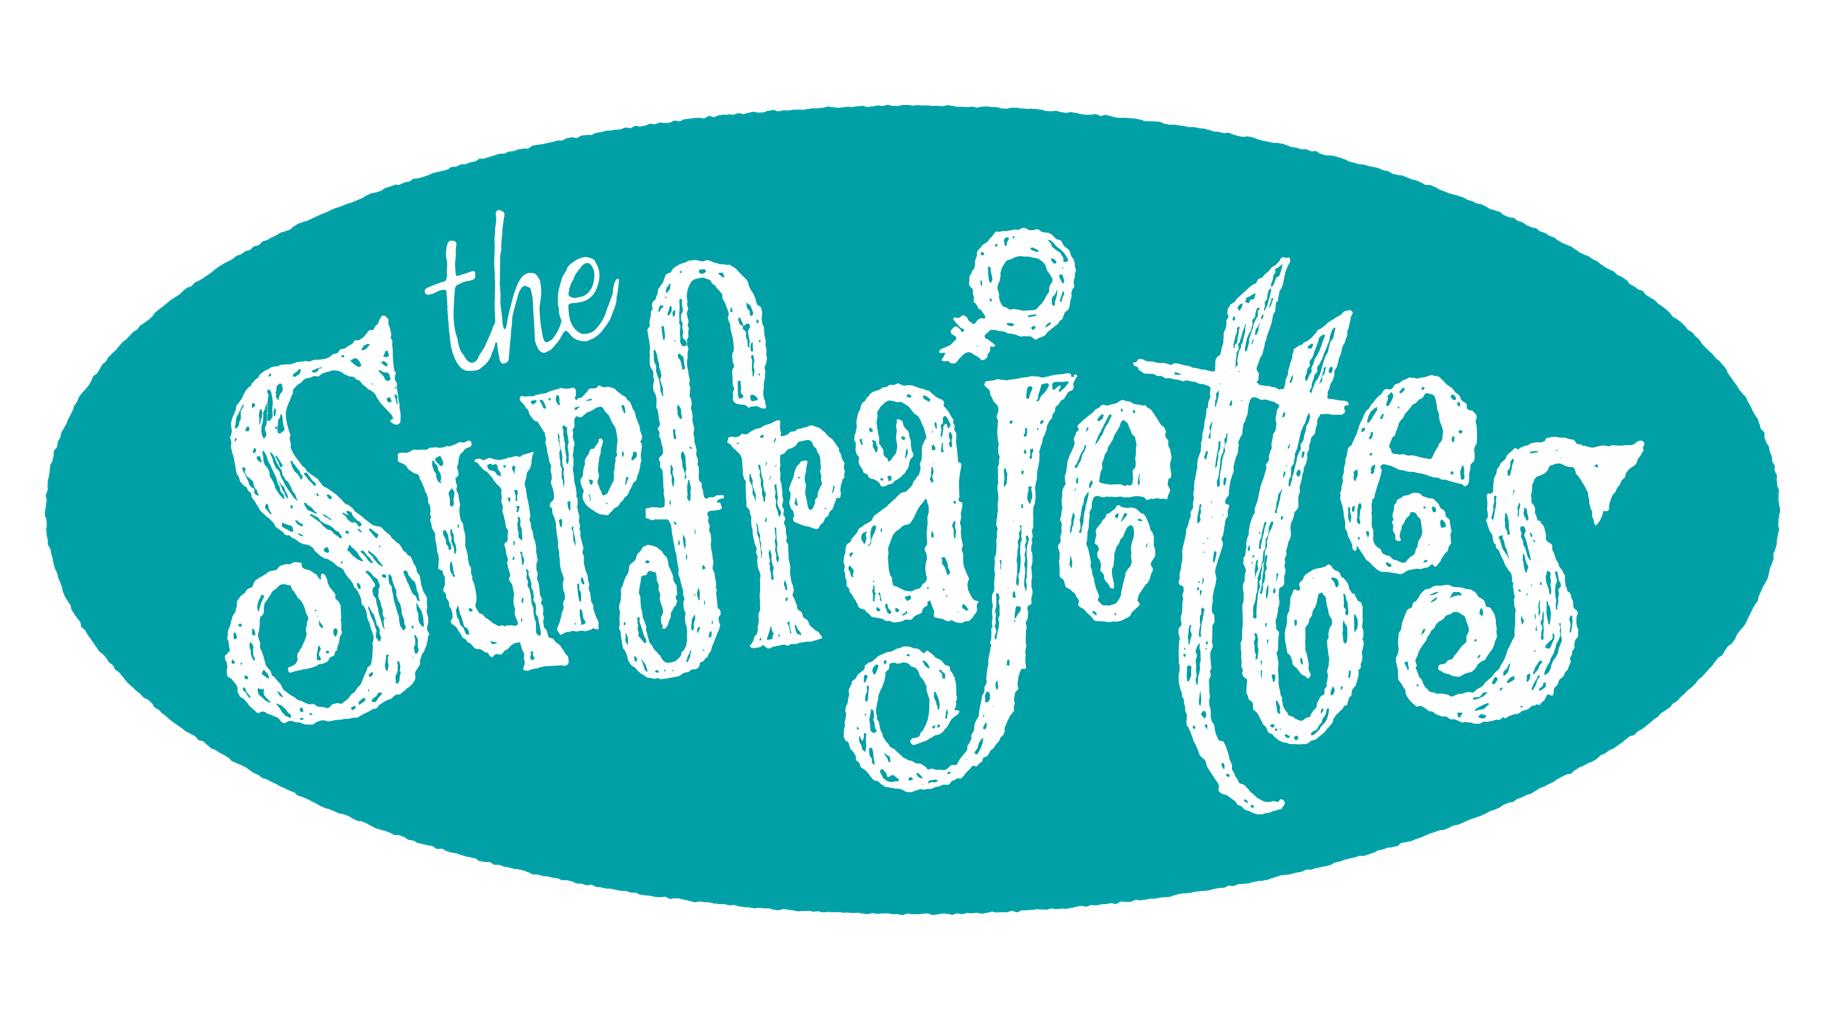 Final unsued Surfrajettes logo